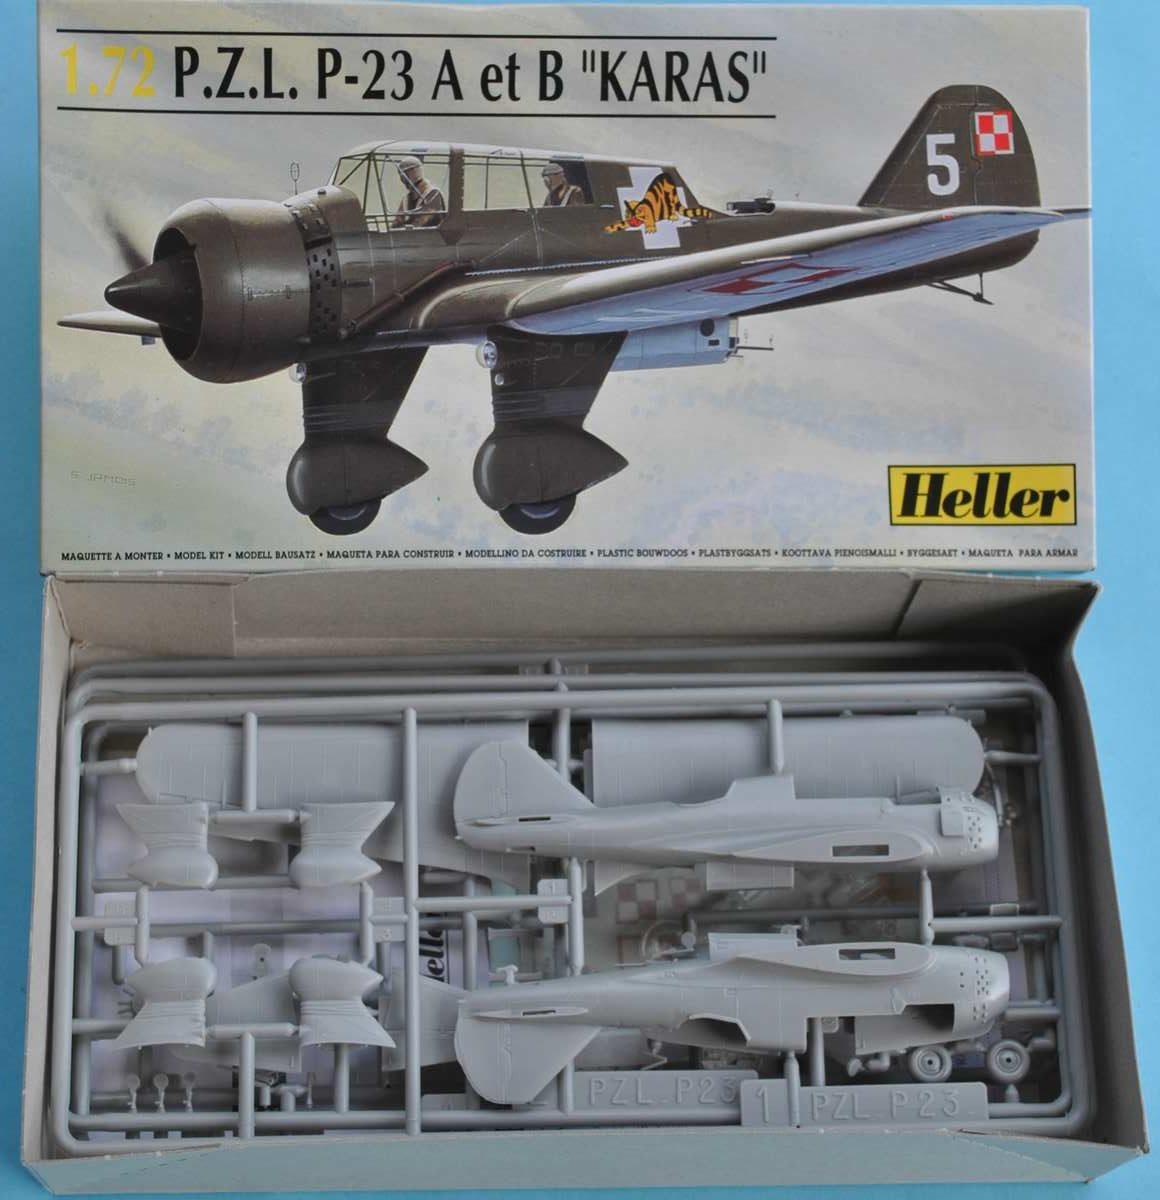 Heller-80247-PZL-P.23-Karas-29-e1504123747556 Kit-Archäologie: PZL P.23 Karas A und B von Heller ( 1:72)